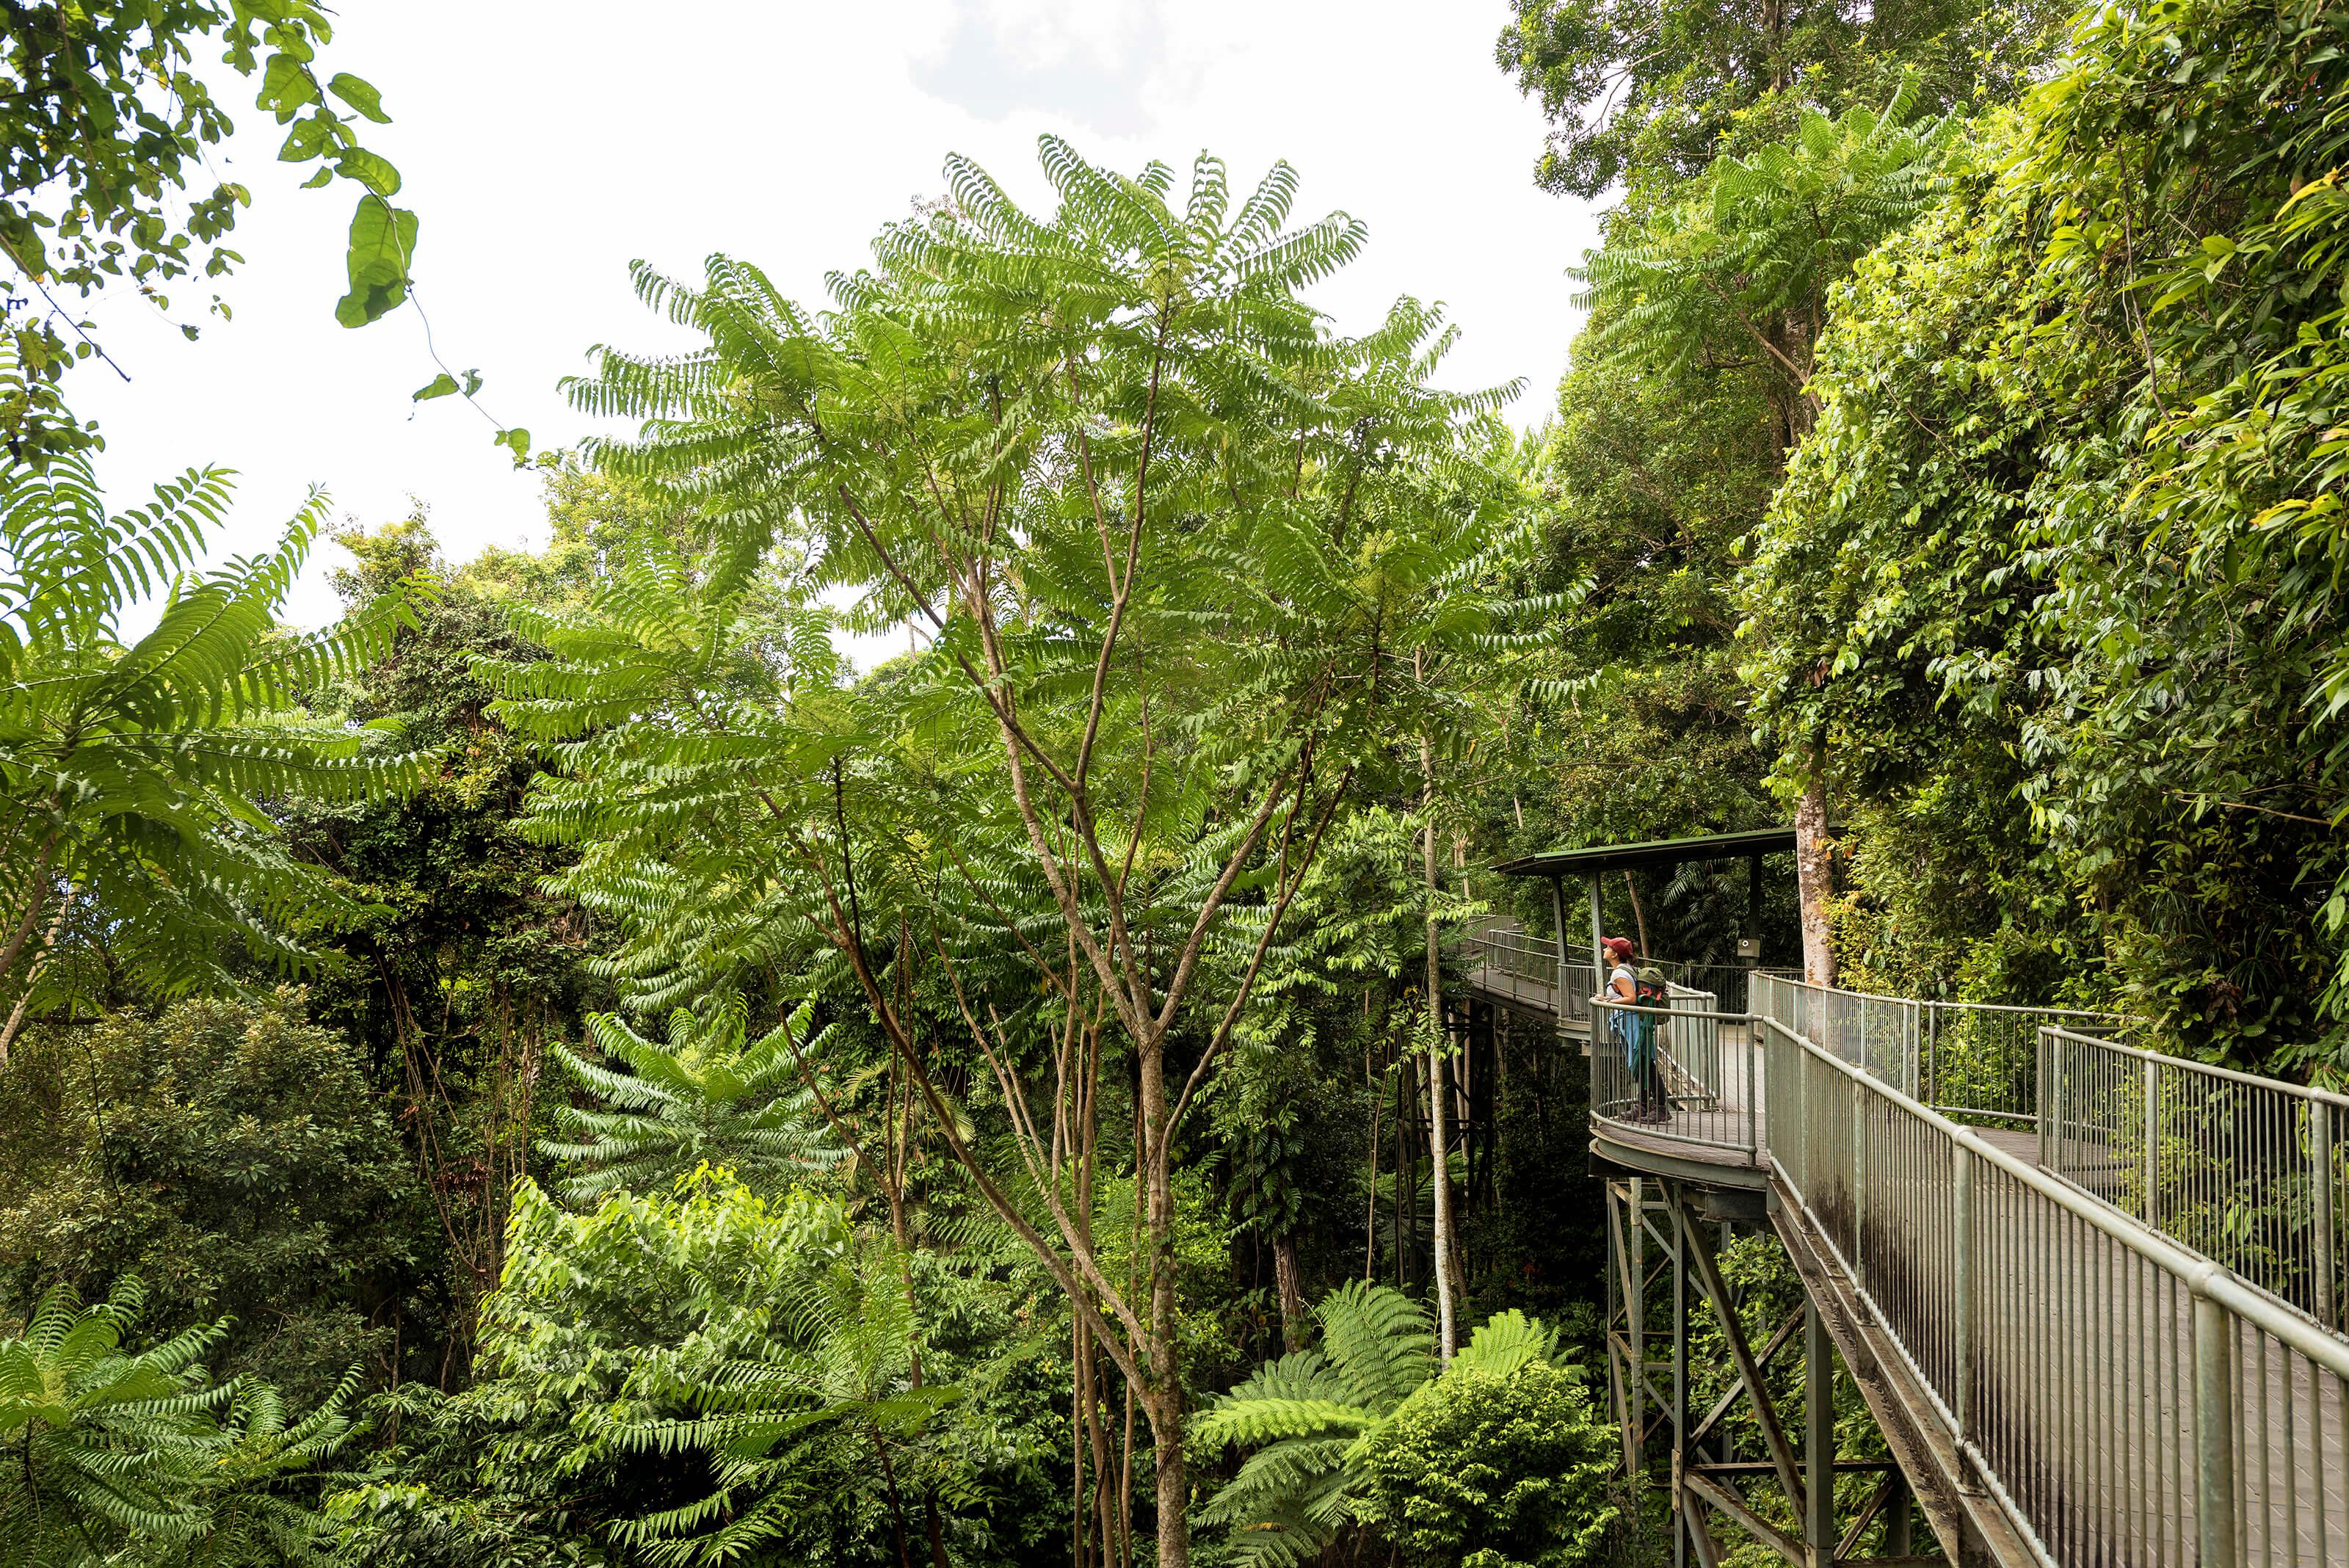 10 Facts About The Wet Tropics Rainforest